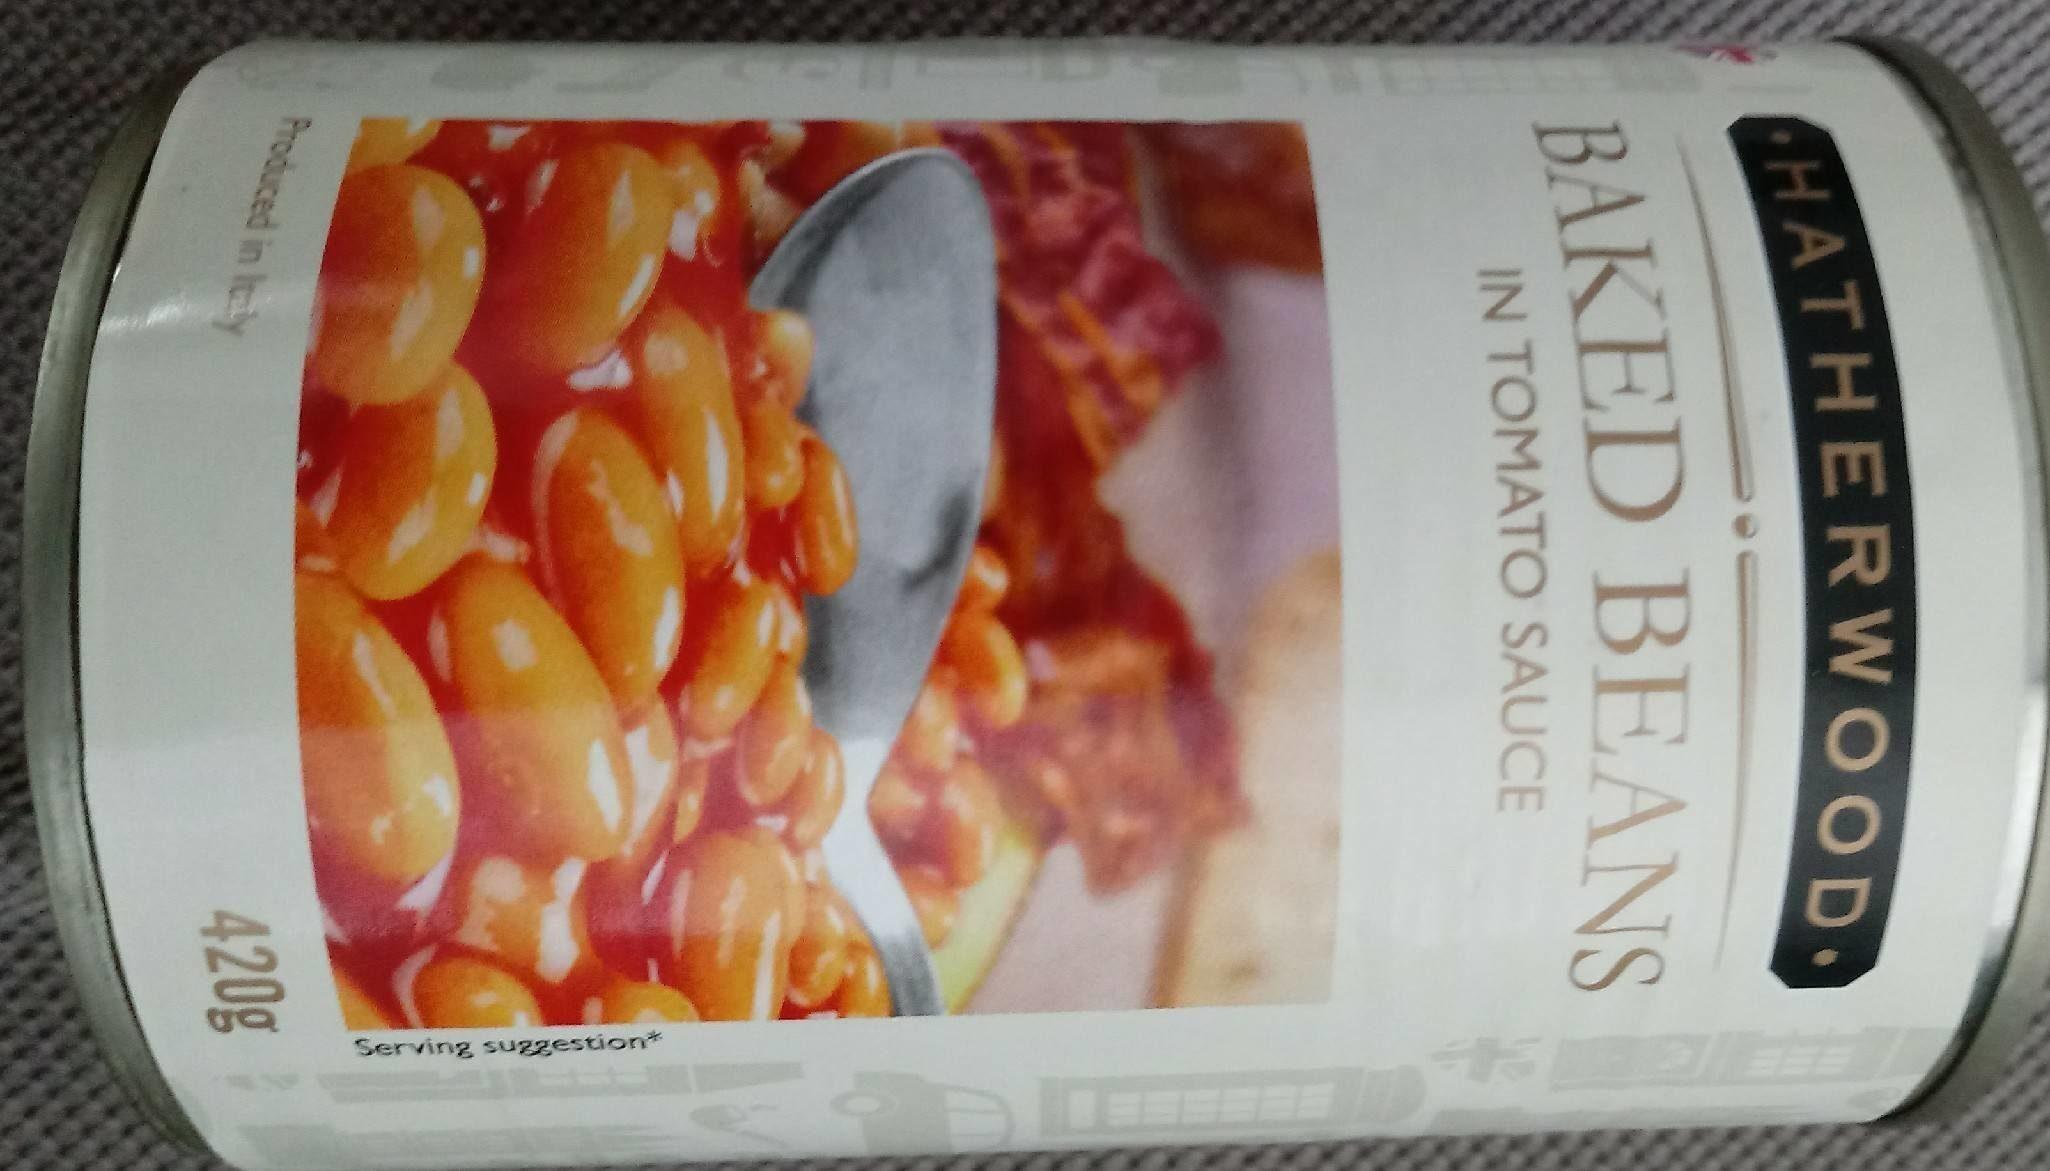 Baked beans in tomate sauce - Produit